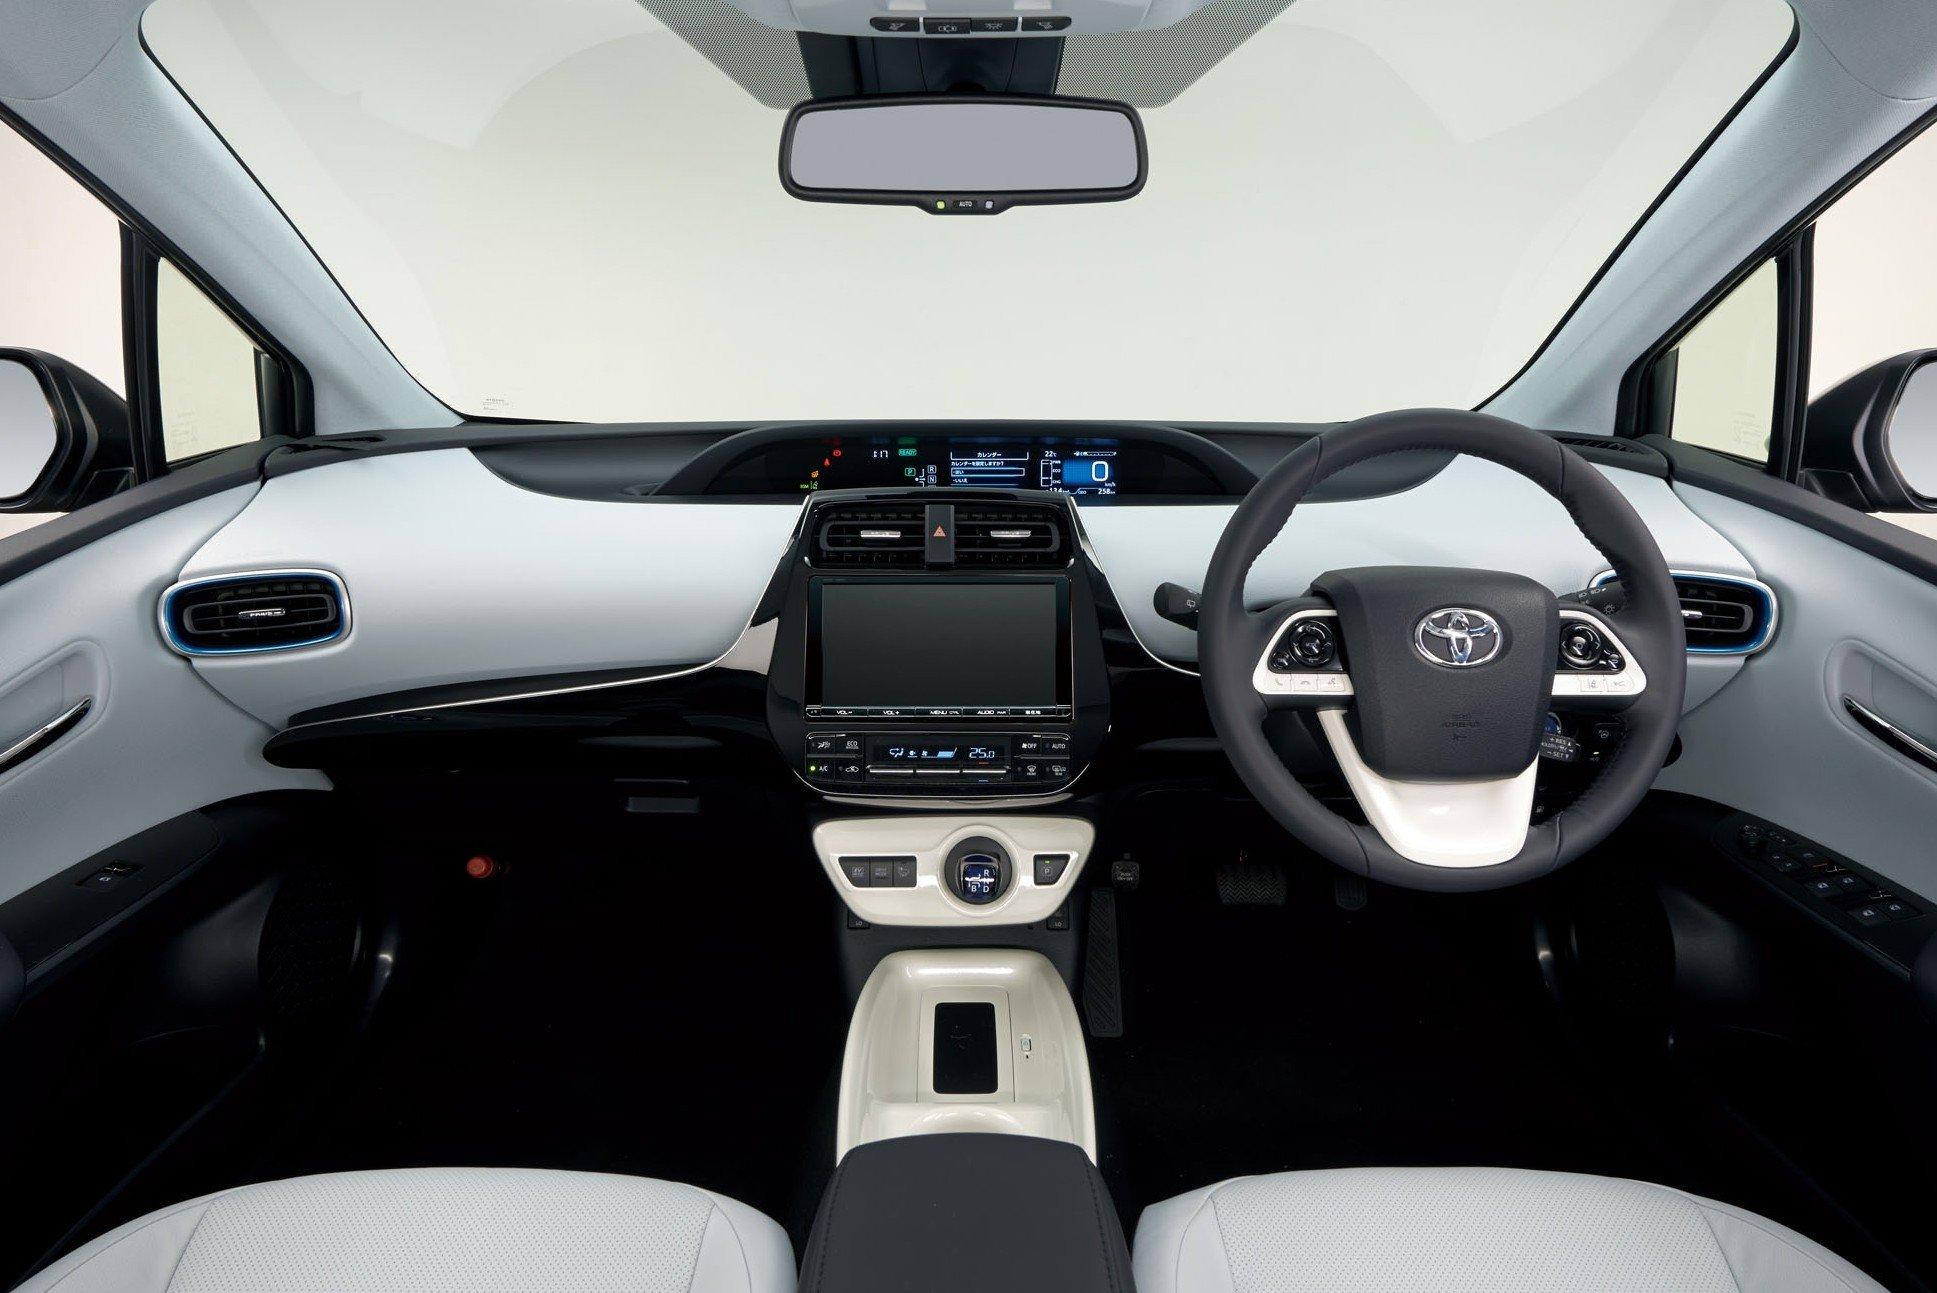 2016 Toyota Prius Specs Revealed 40 Km L Target Fc Image 391852